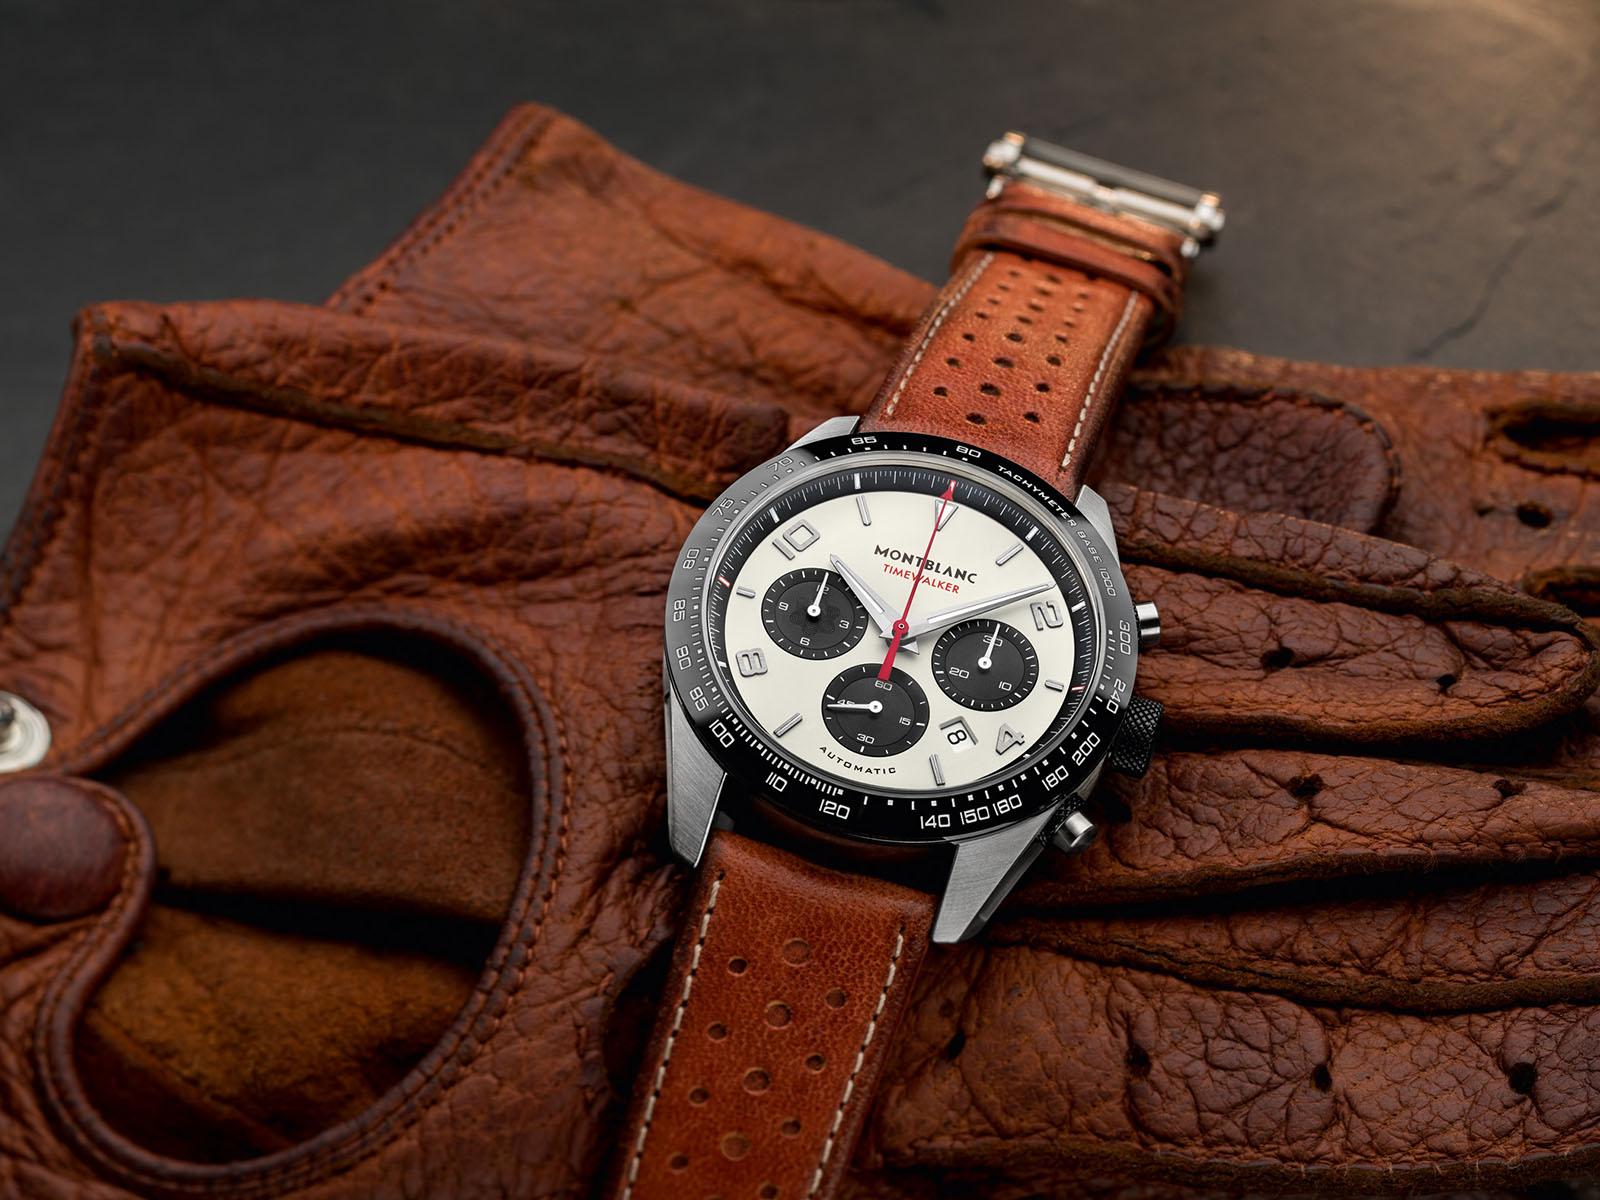 montblanc-timewalker-manufacture-chronograph-118488-2.jpg